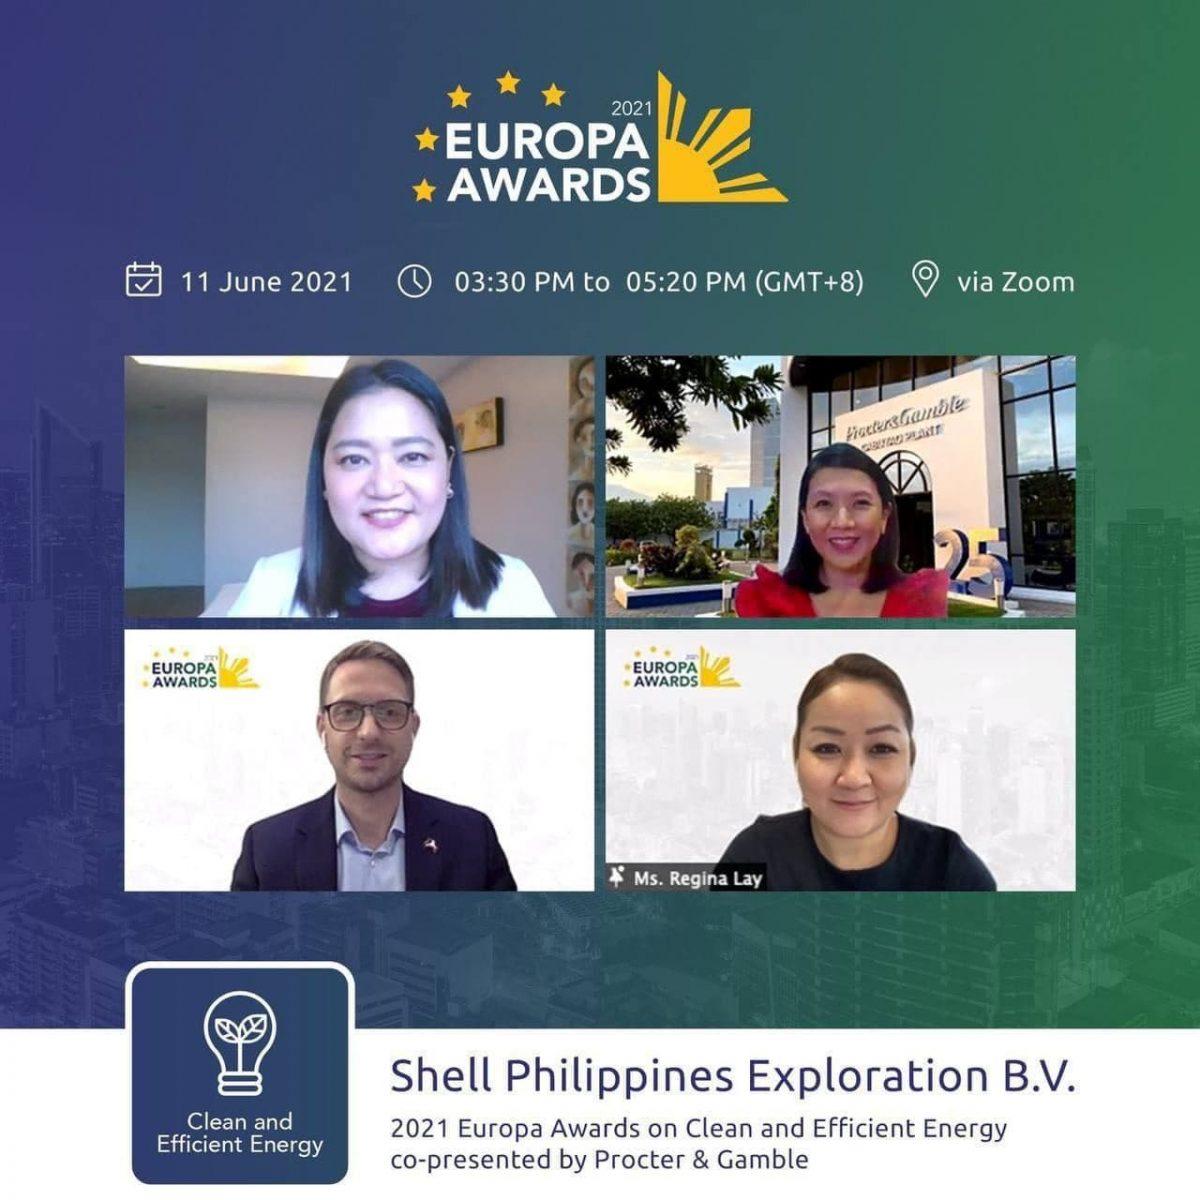 SPEX Europa Awards